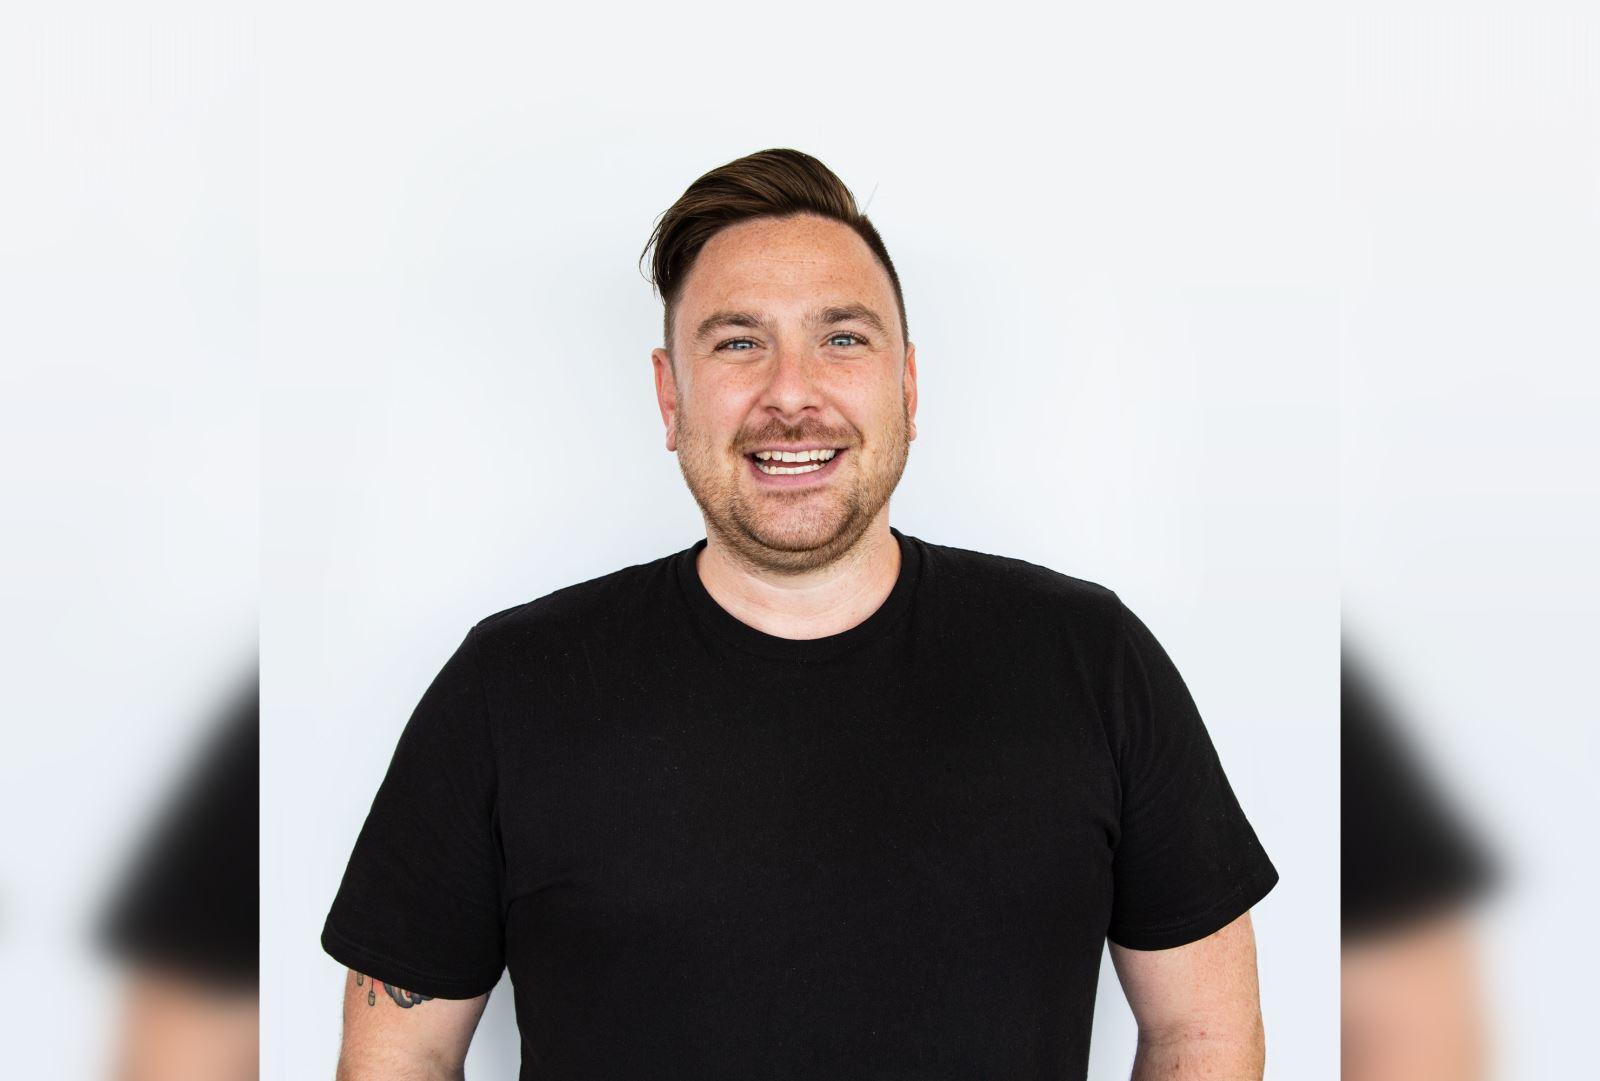 Robert Stone, National people and talent director, McCann Australia